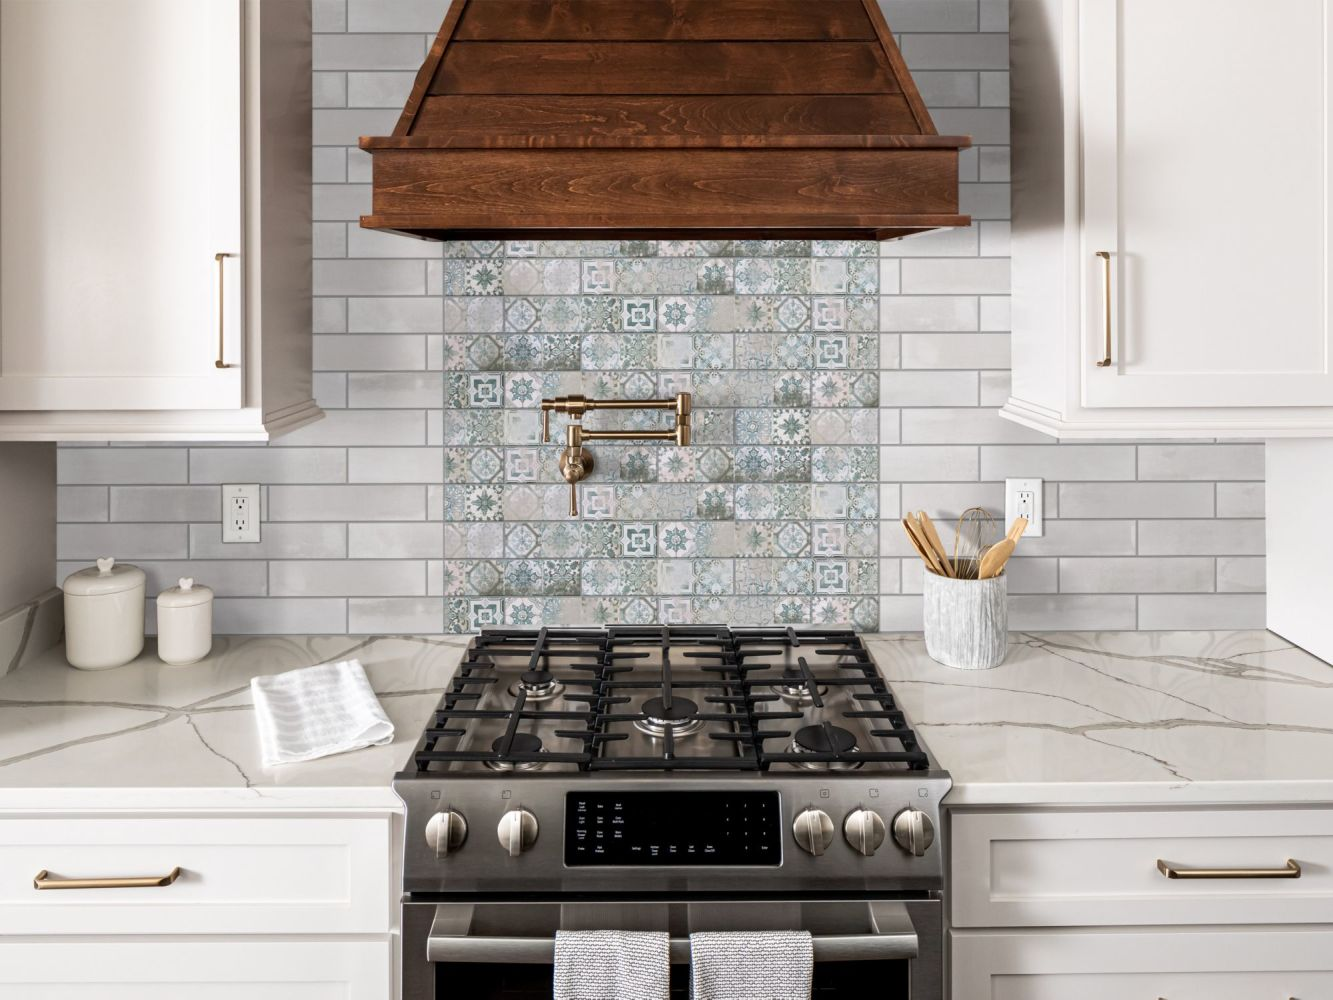 Shaw Floors Home Fn Gold Ceramic Tortona 2.5 X 11 White 00100_TG42E